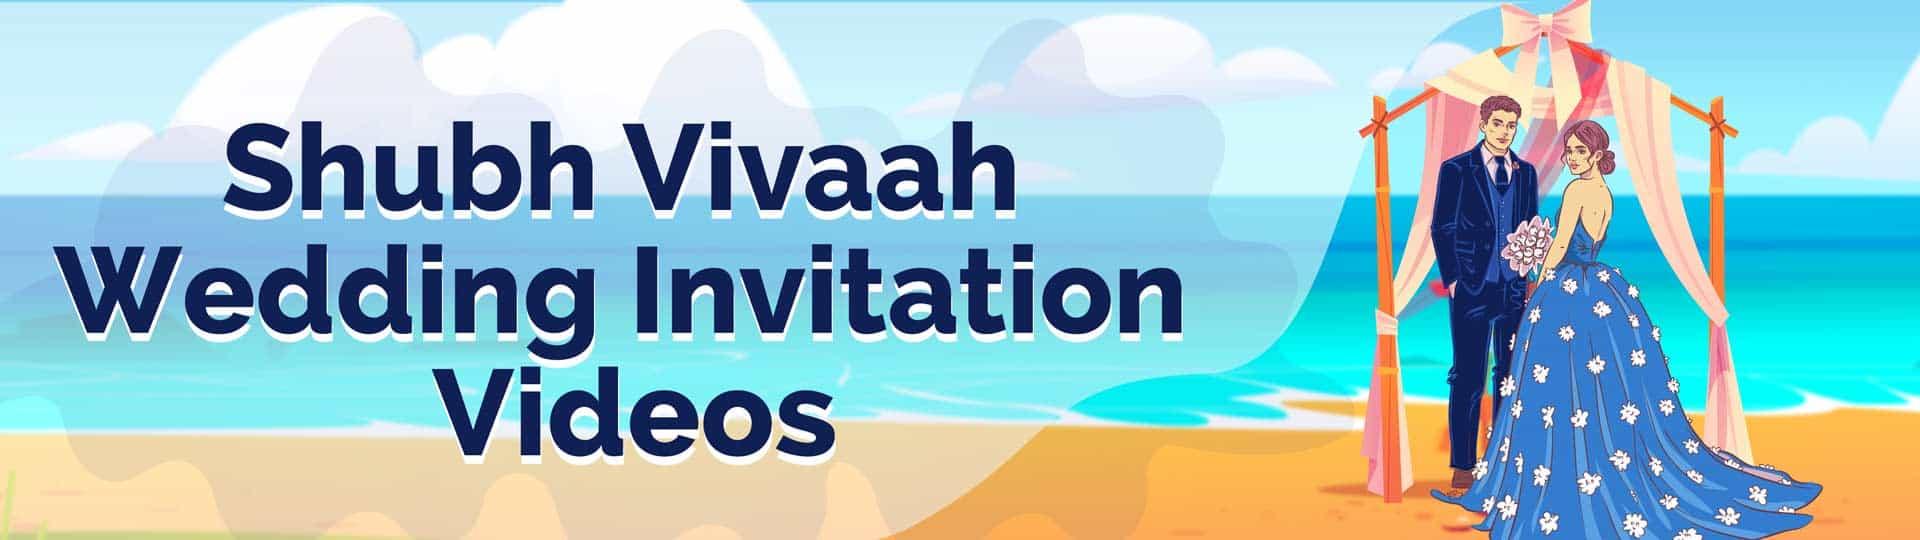 Shubh Vivaah Wedding Invitation Videos